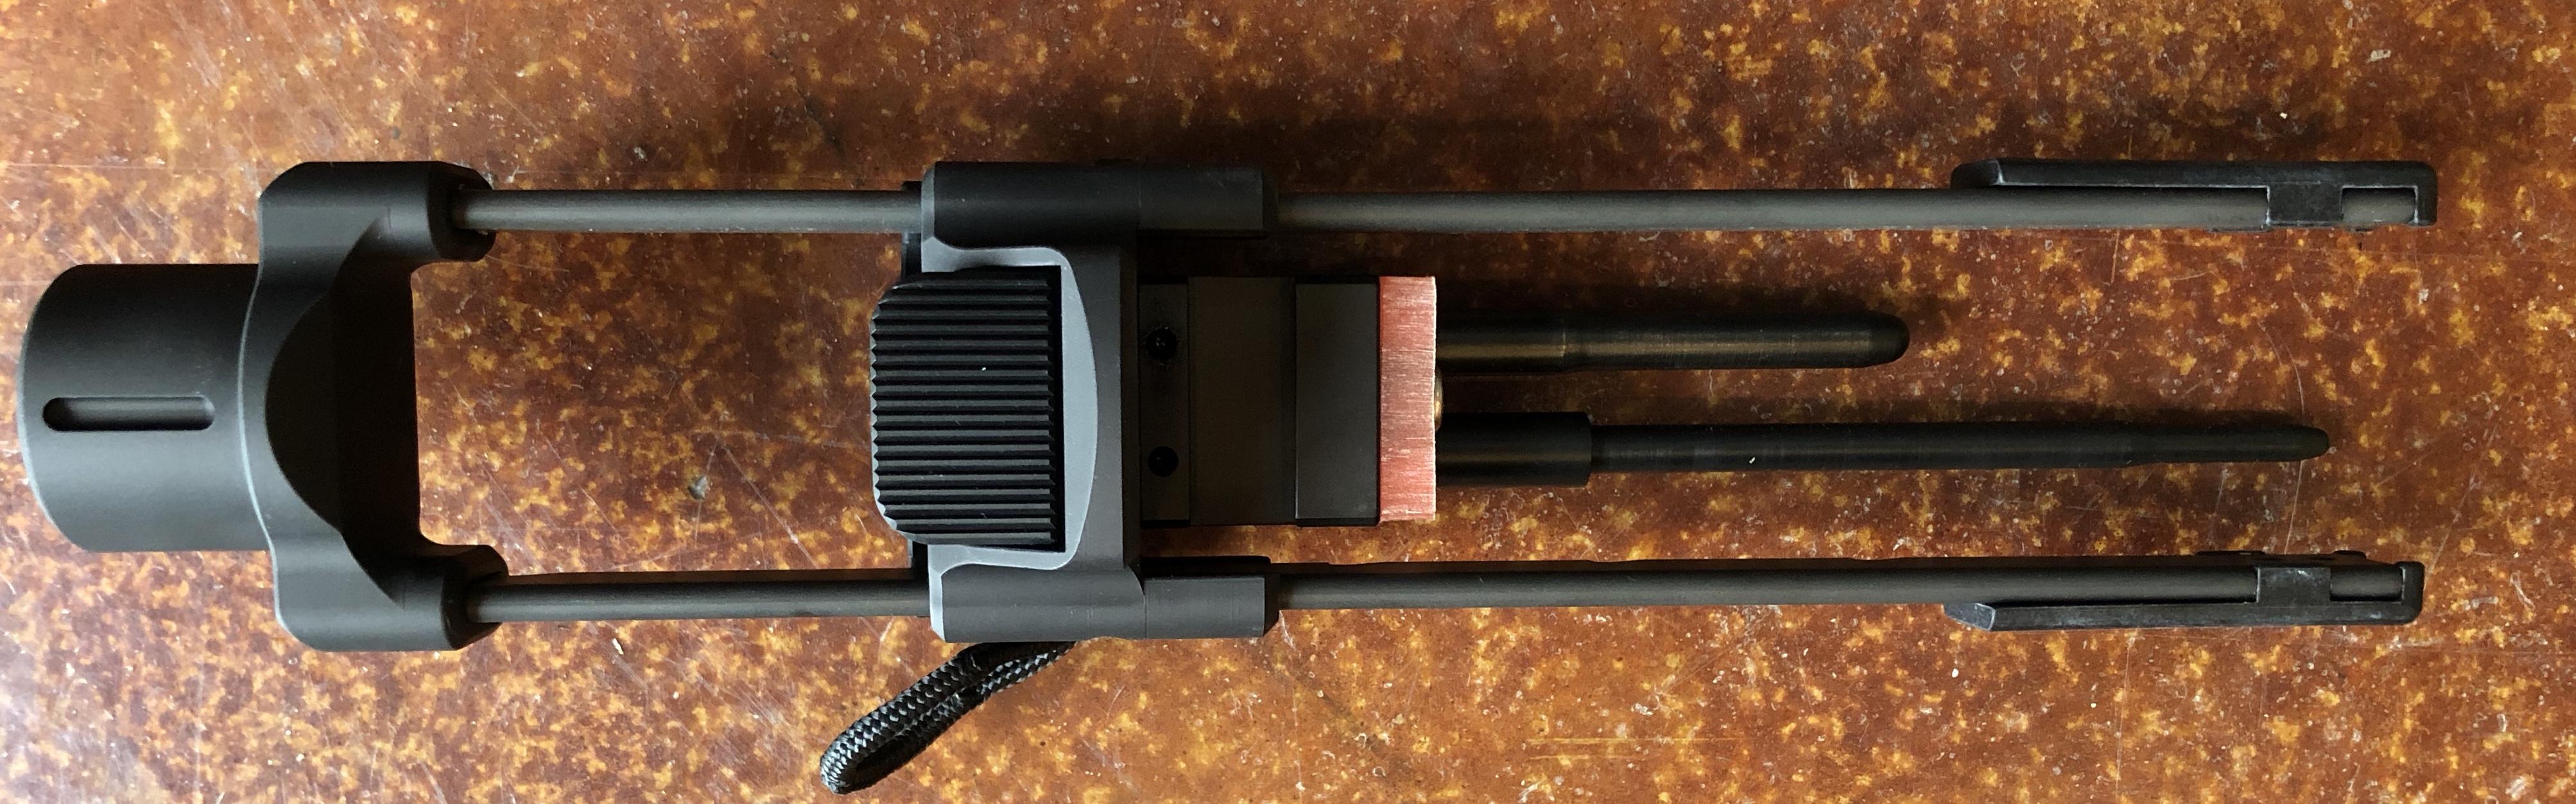 B&T KH9 Telescopic Brace